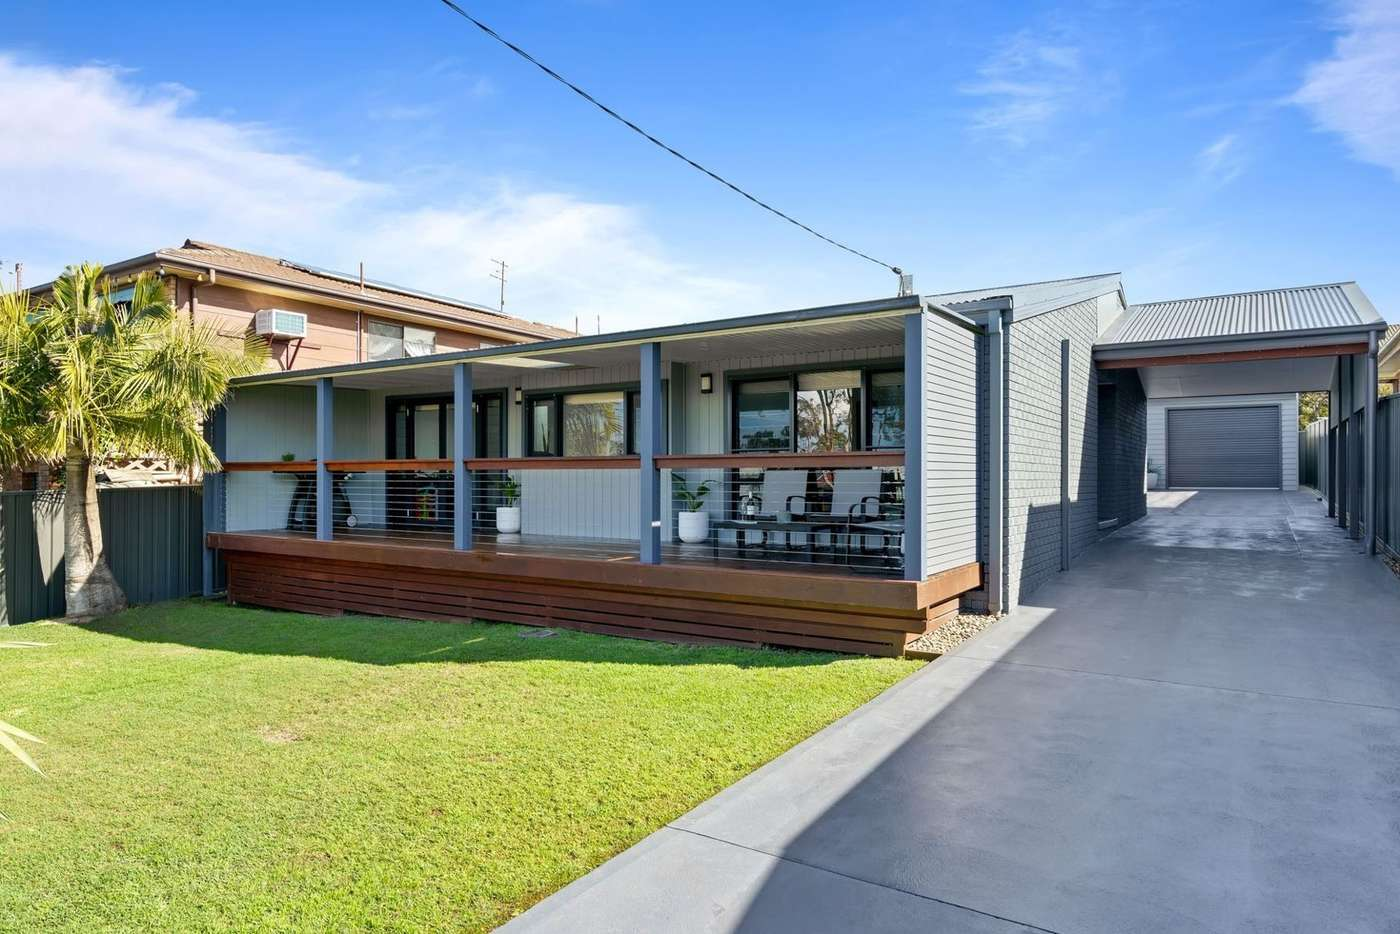 Main view of Homely house listing, 92 Coonanga Avenue, Halekulani NSW 2262